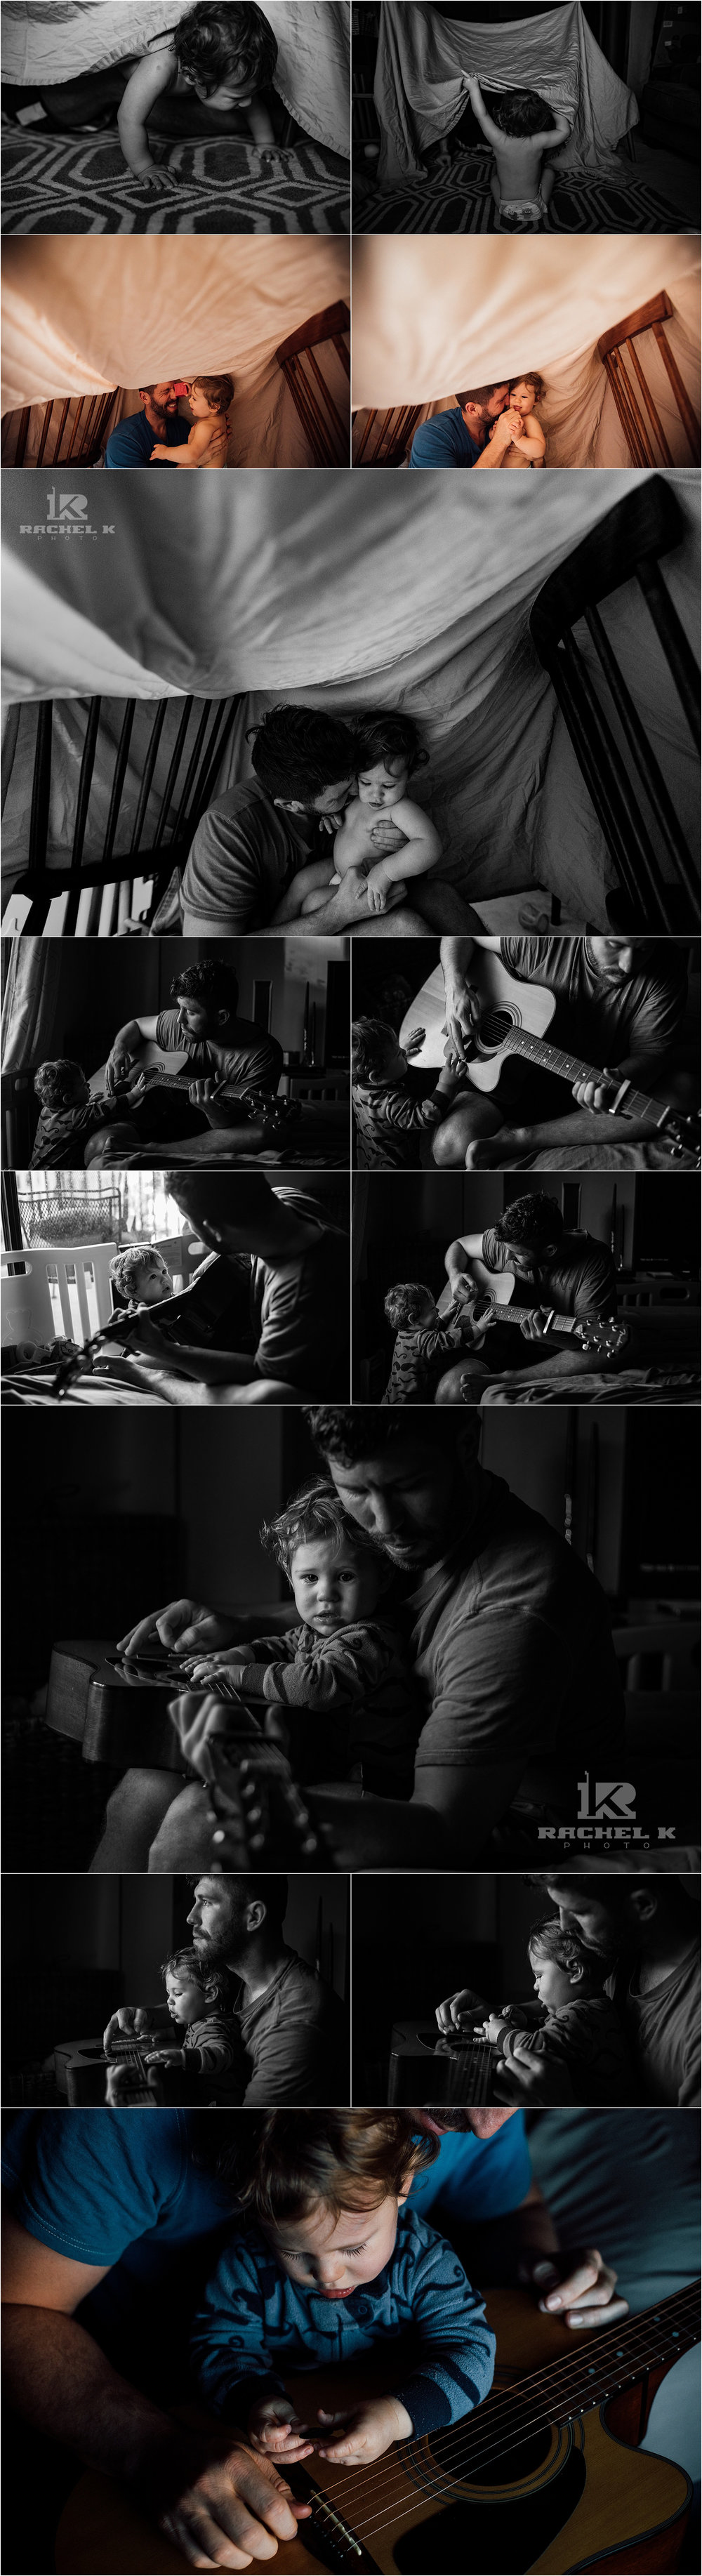 Personal photos for September by Fairfax family photographer Rachel K Photo